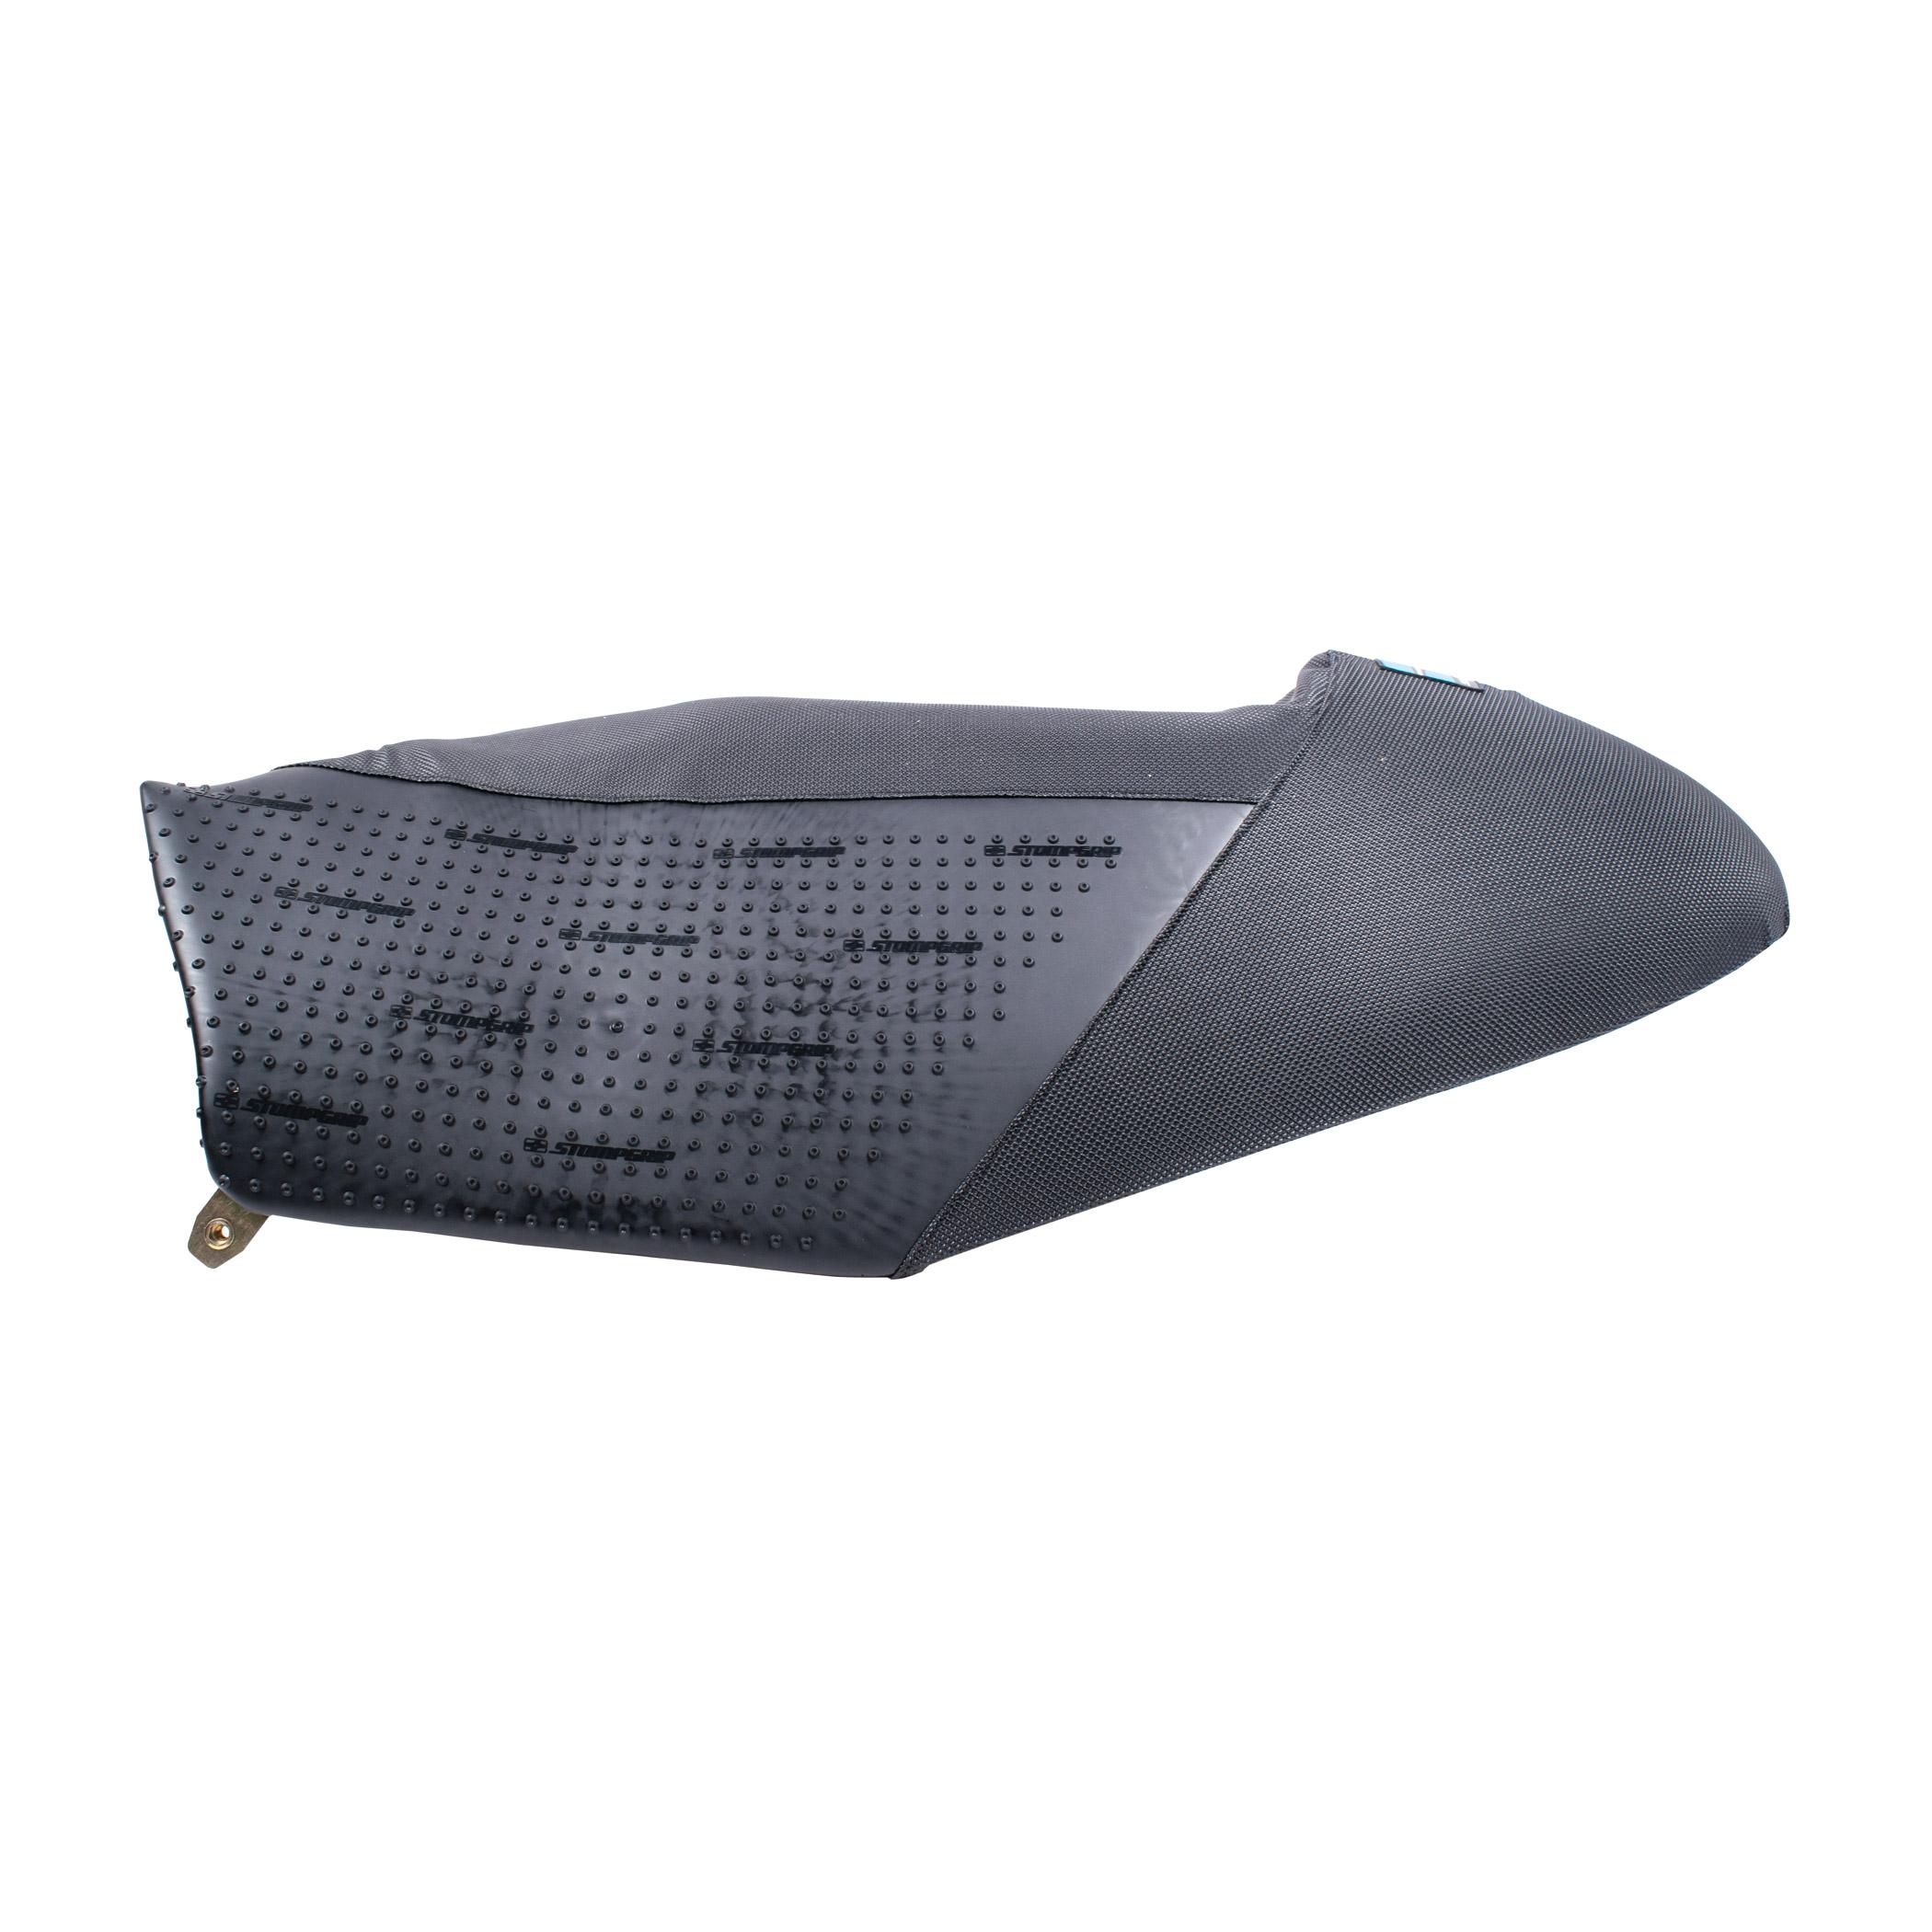 Enjoyable Polaris Gripper Seat Cover Iq Race Sled Forskolin Free Trial Chair Design Images Forskolin Free Trialorg